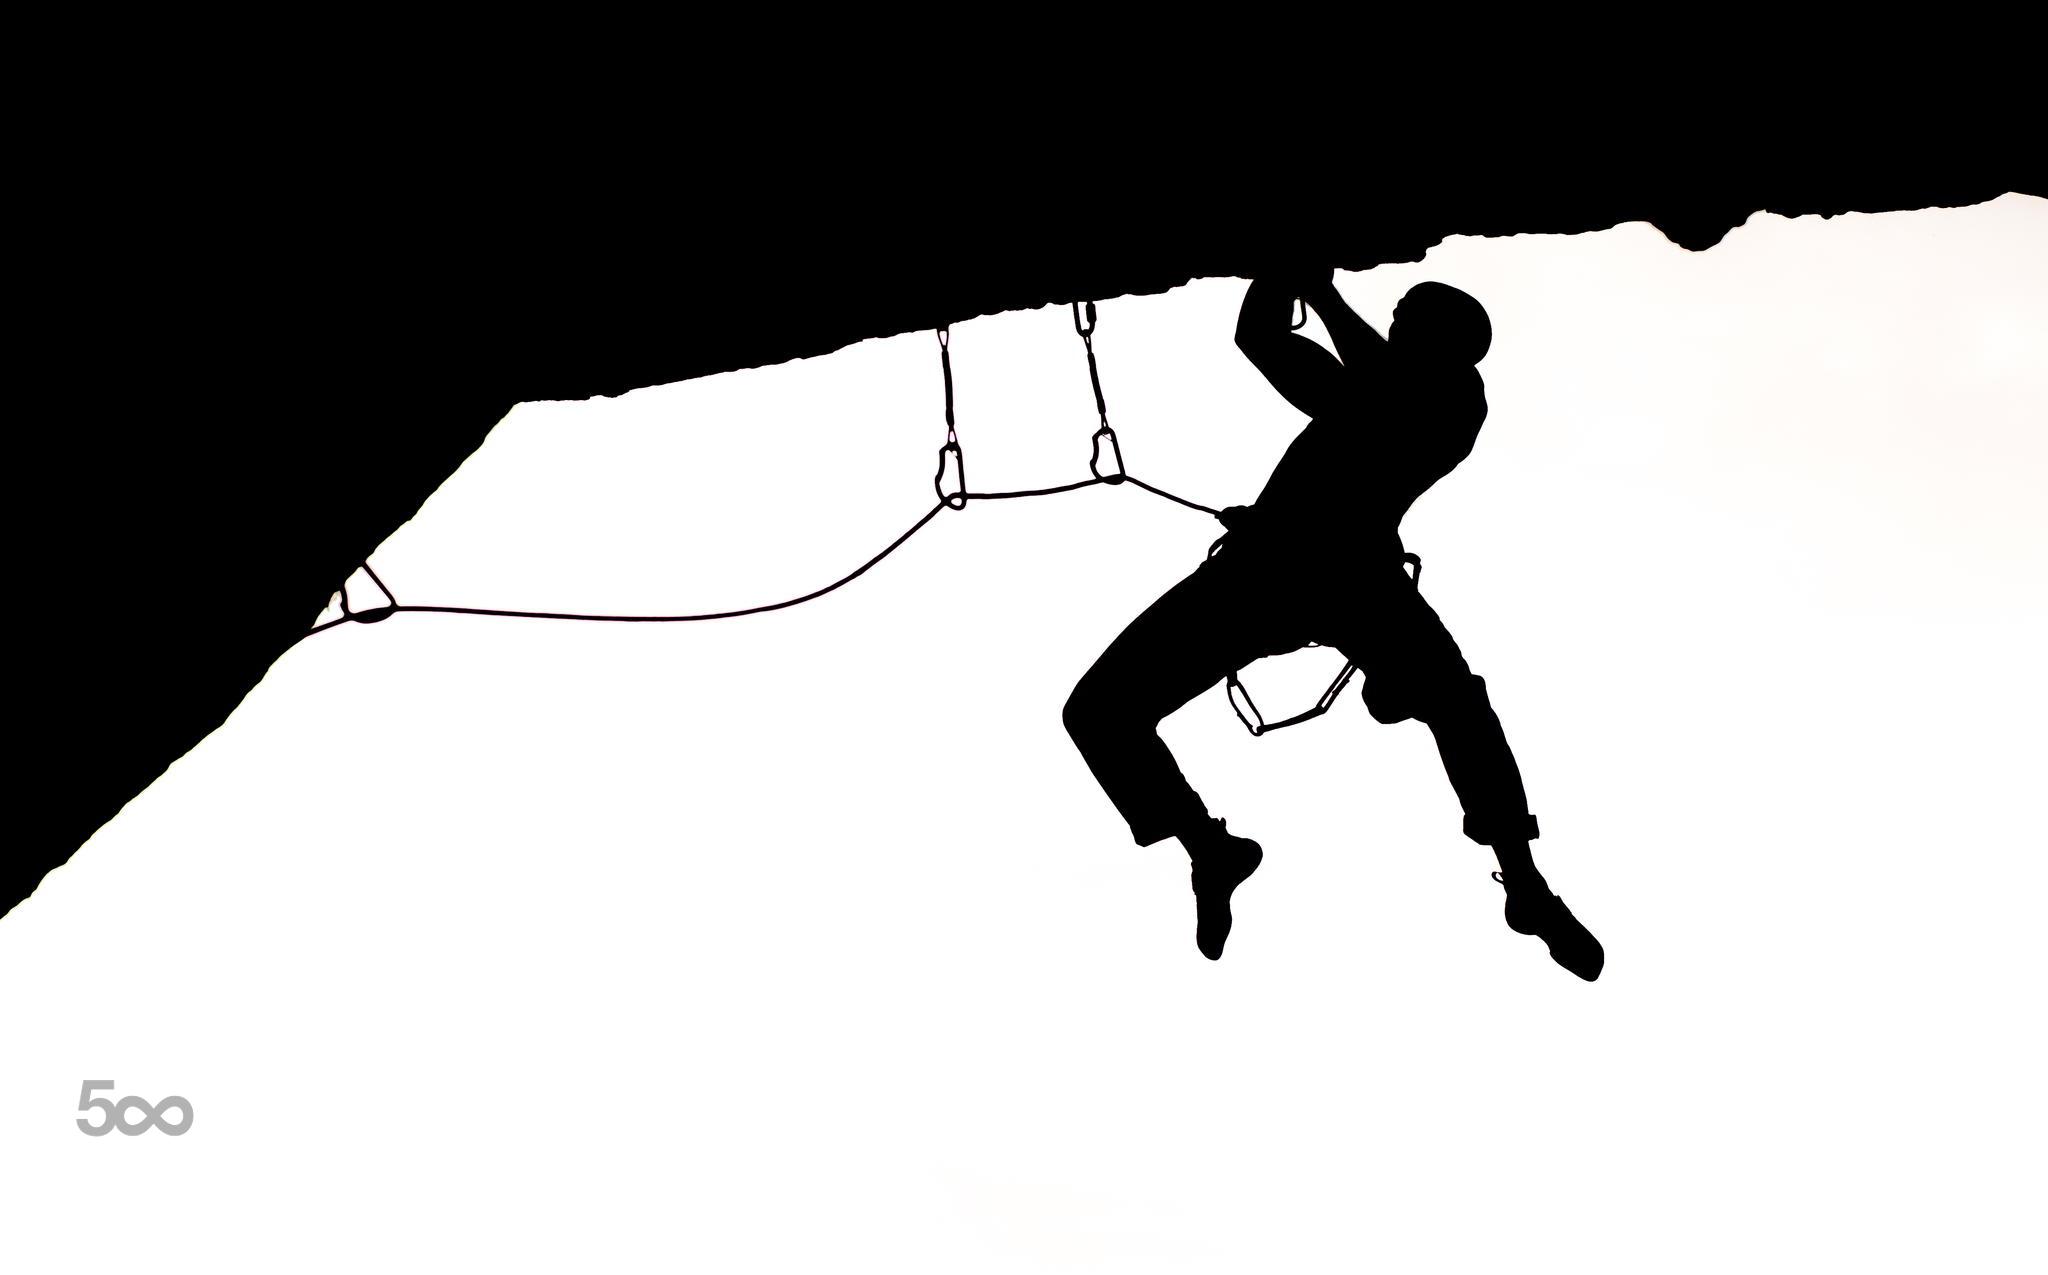 Free Hill Climb Cliparts, Download Free Clip Art, Free Clip Art on.